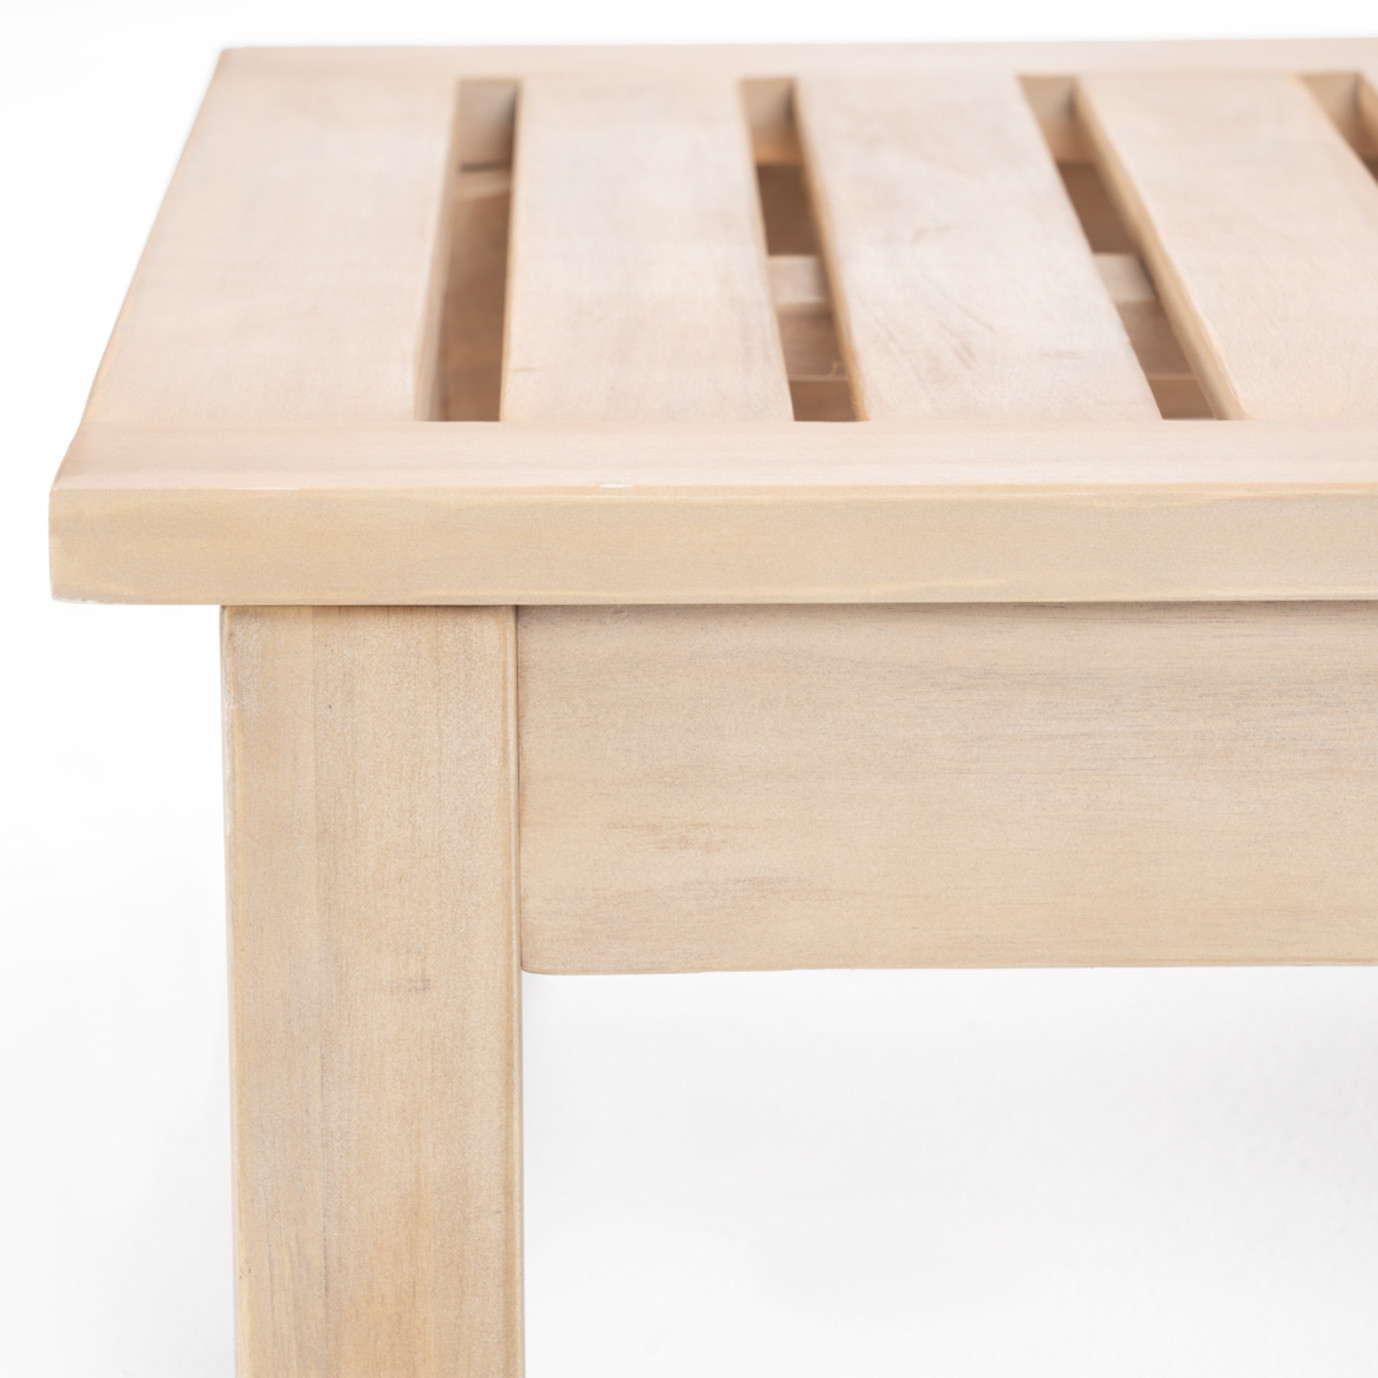 Kooper Chaise Lounges - Slate Gray